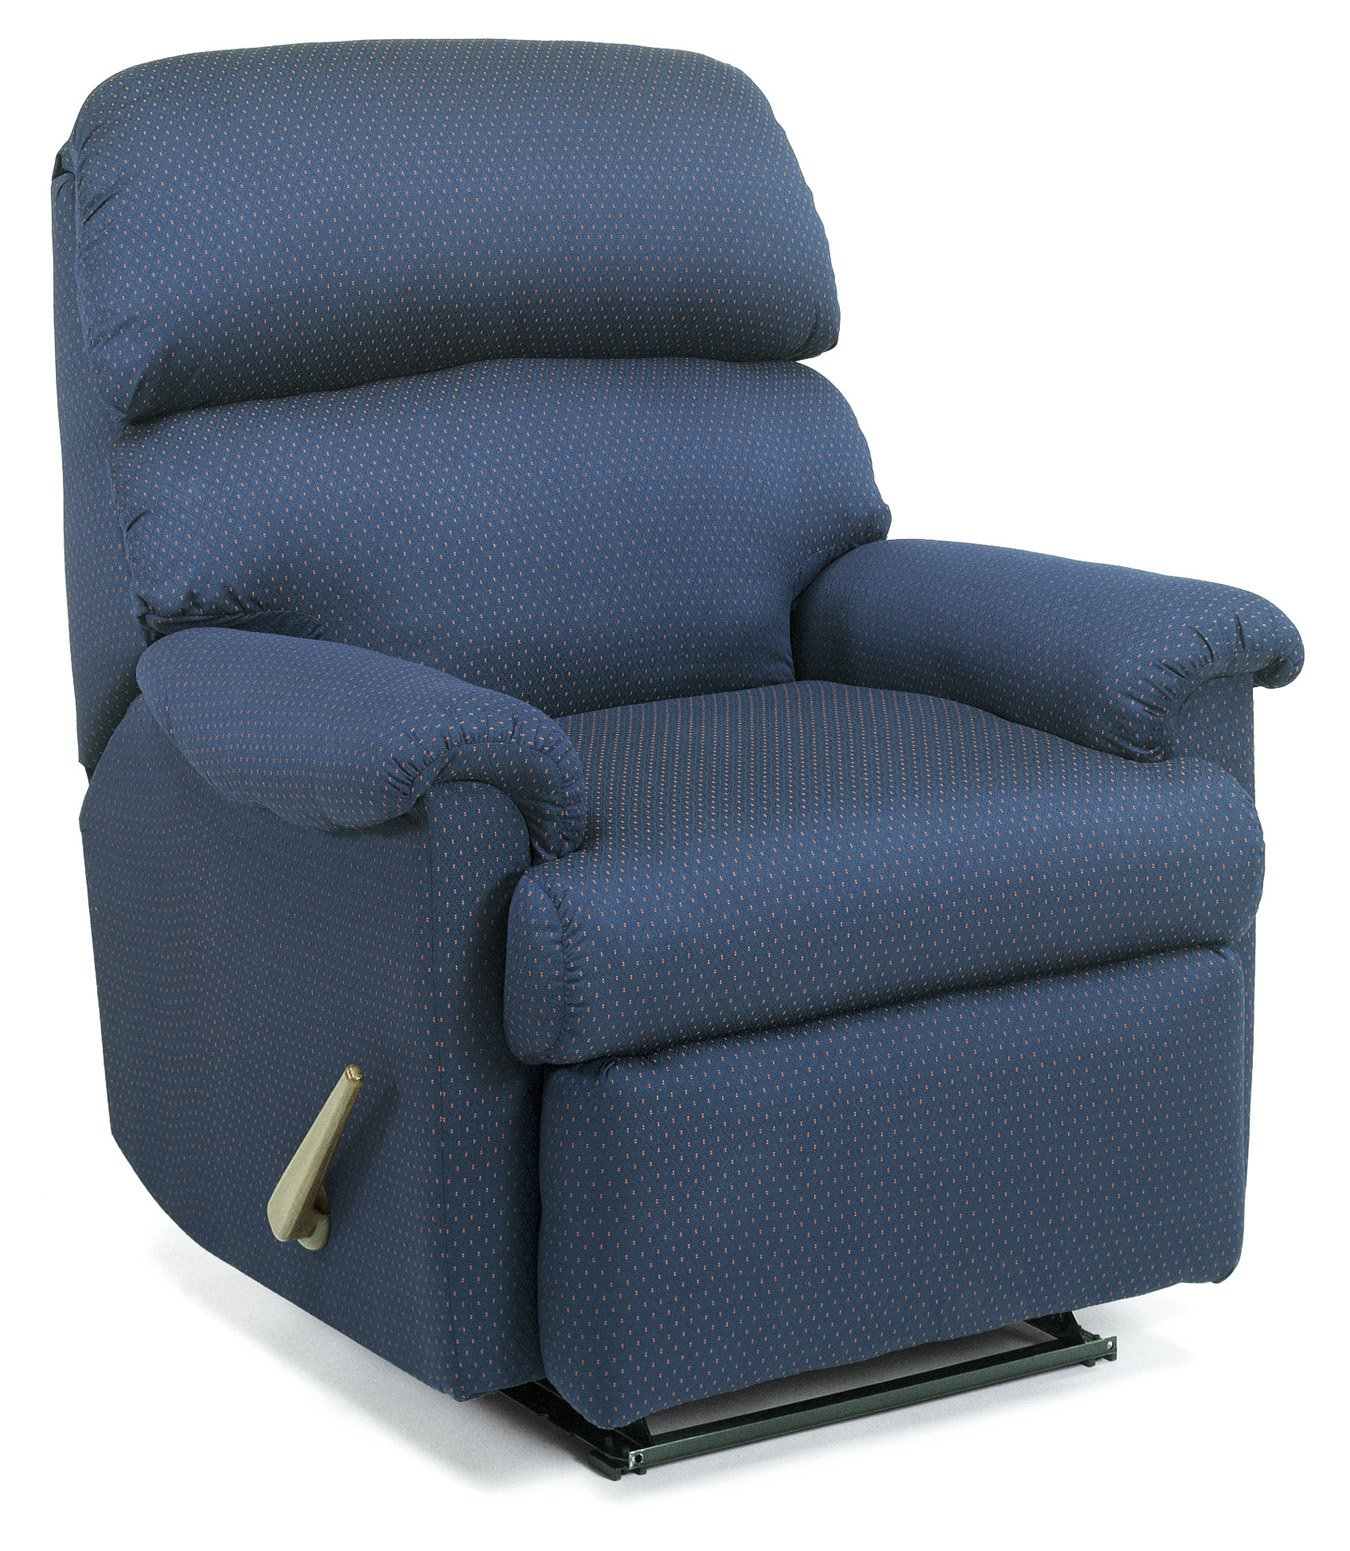 Camo Lift Chair: Flexsteel.com